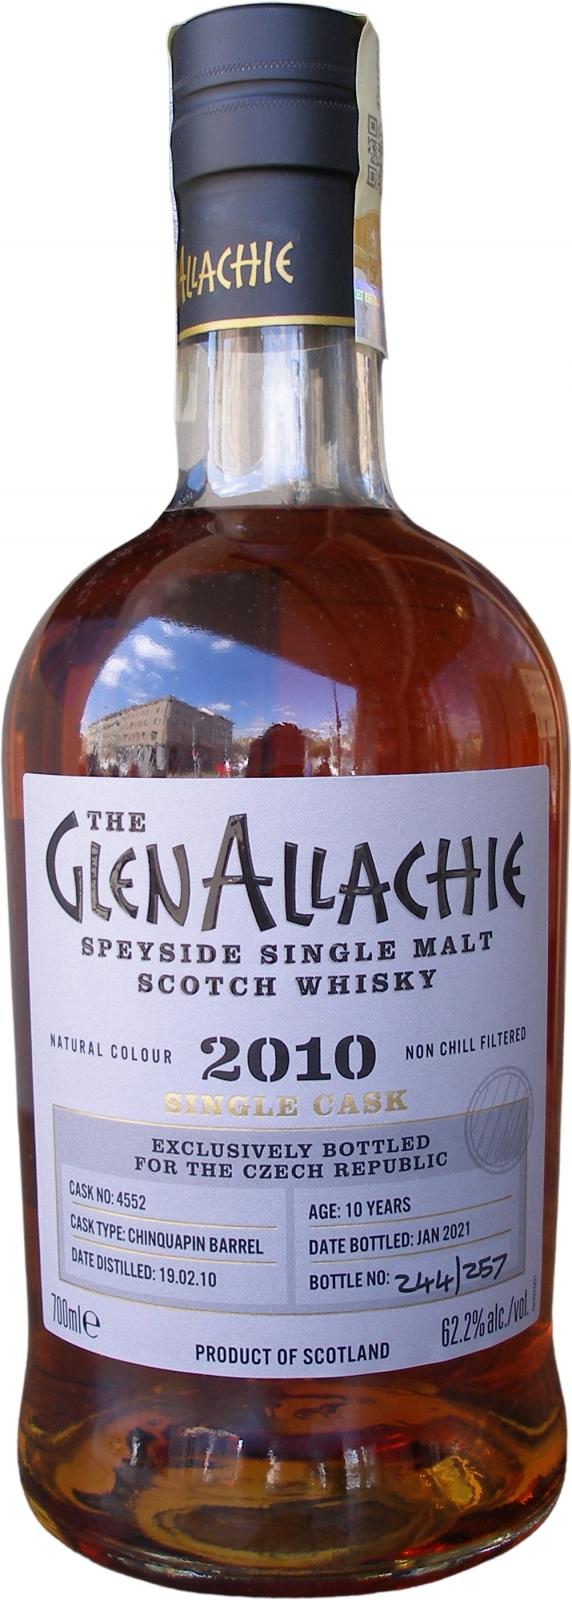 Glenallachie 2010